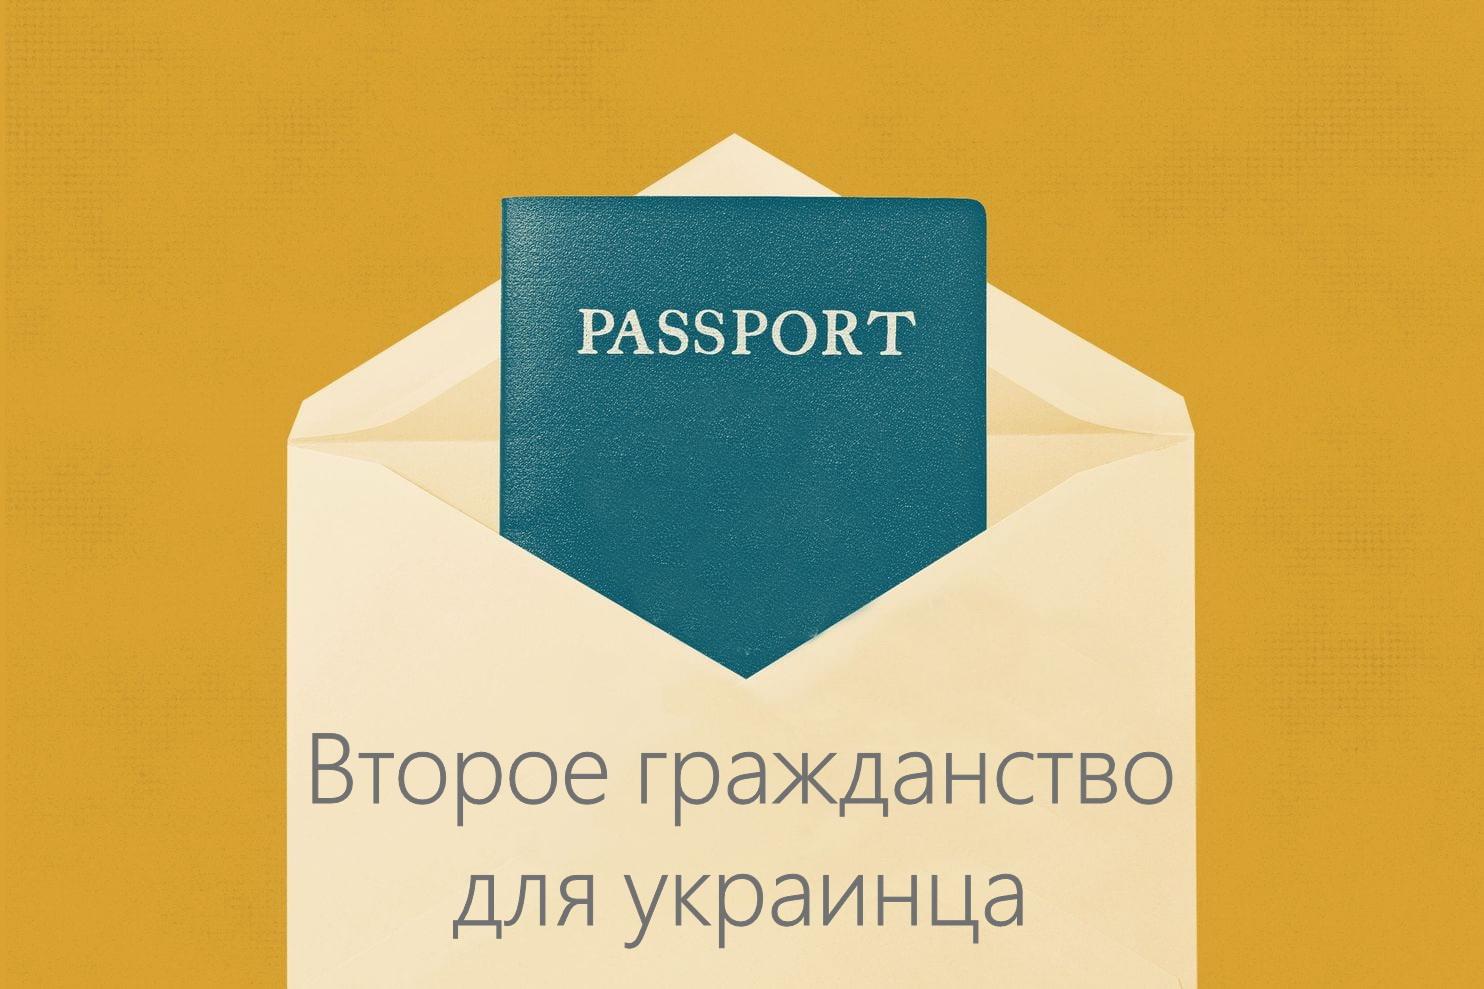 доступное гражданство для украинца